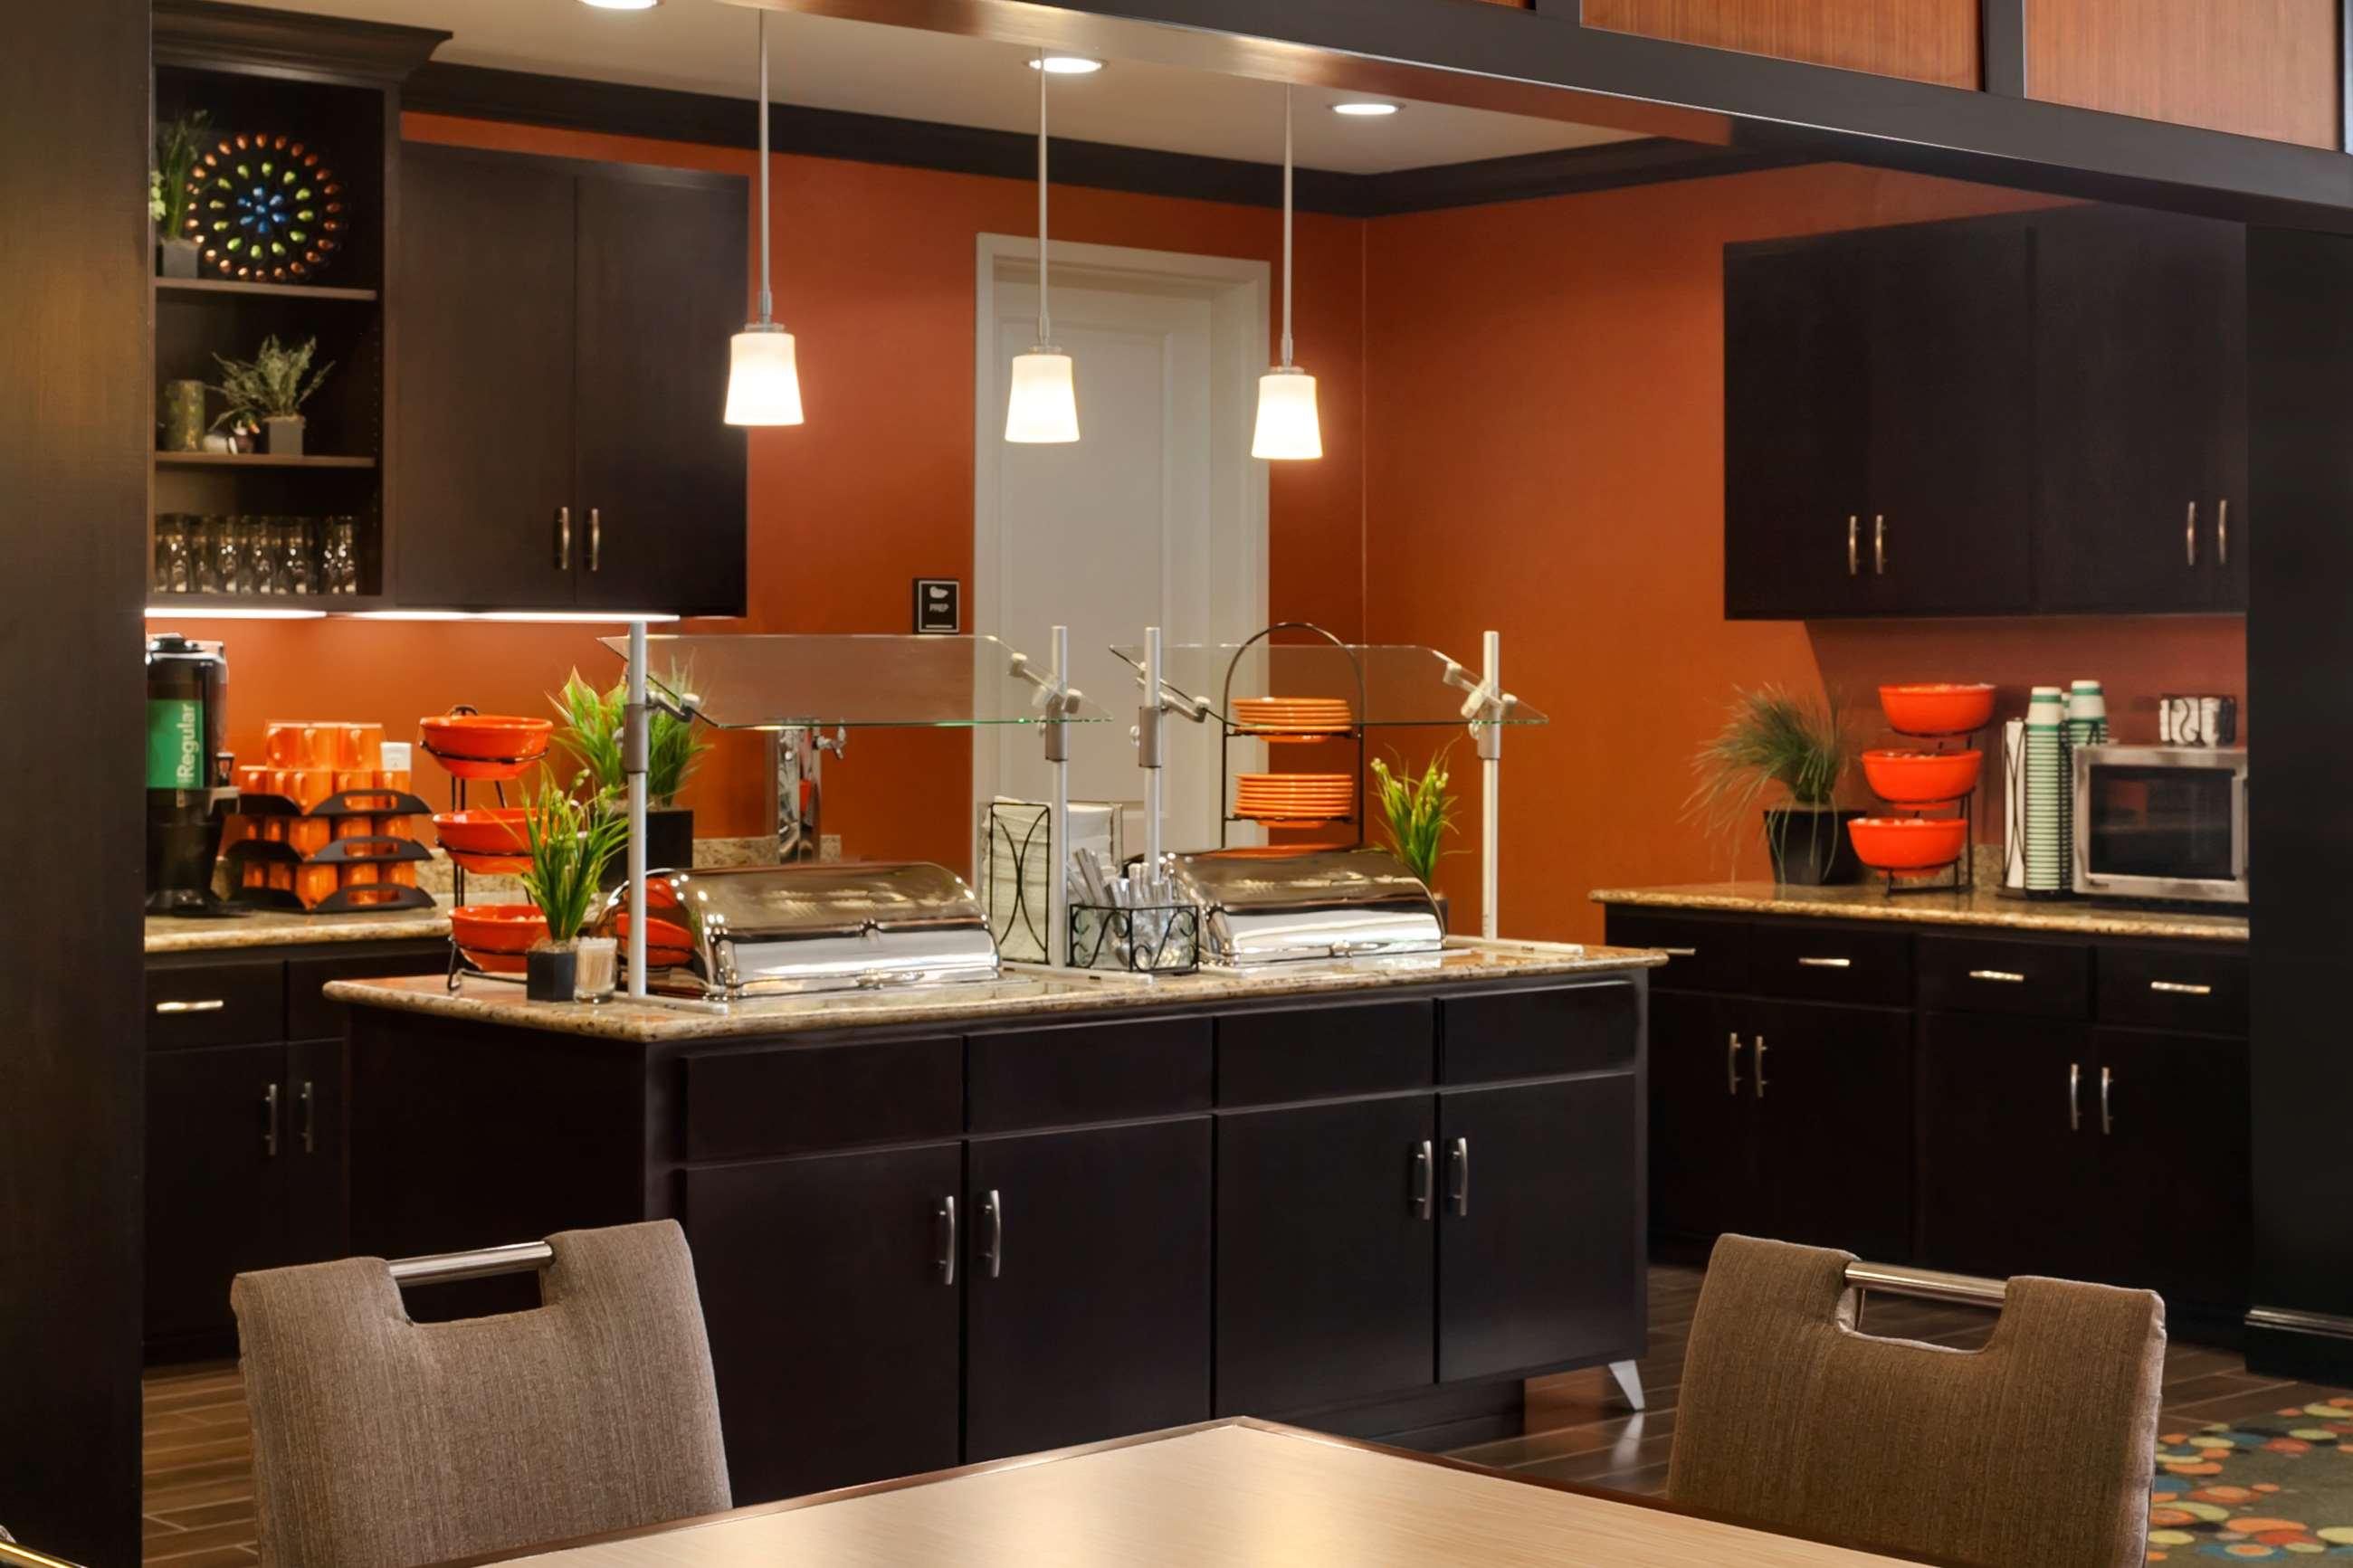 Homewood Suites by Hilton Joplin, MO image 4